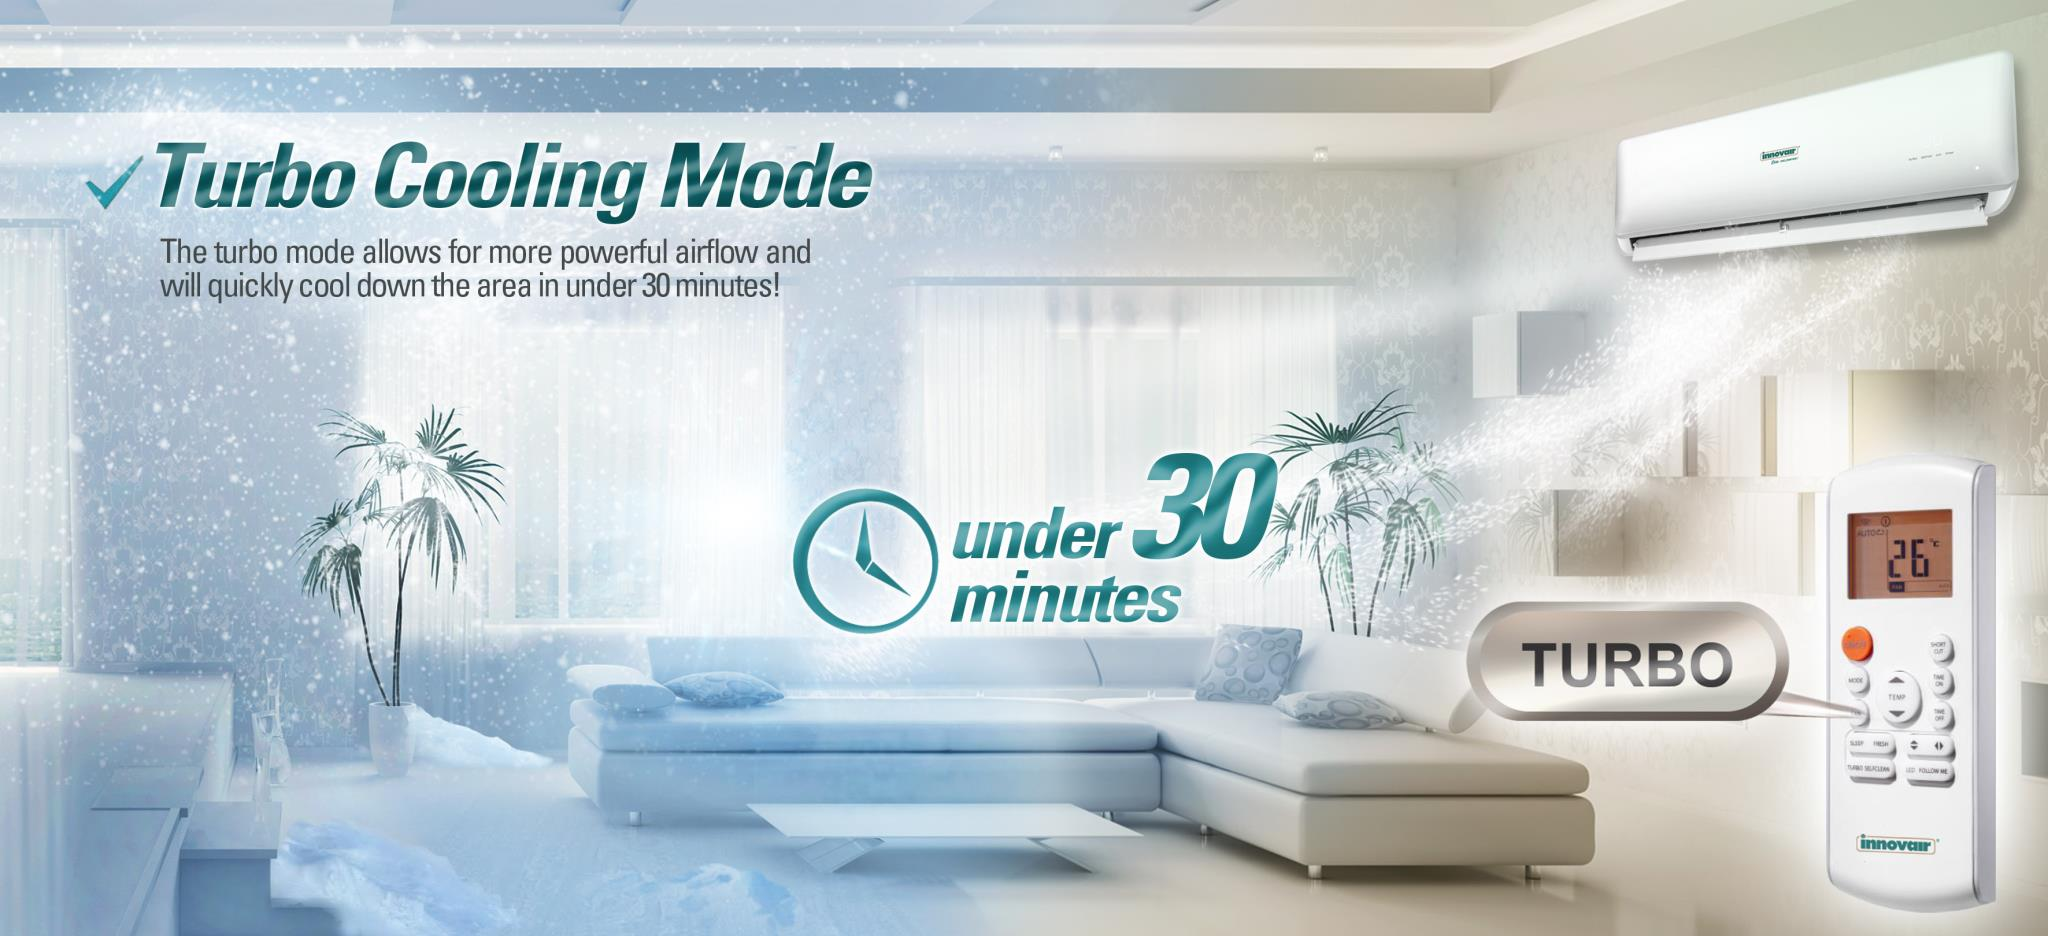 All New Mini Split Ductless Heatpump Systems  Innovair 18000 Btu In Minisplitwarehouse Com